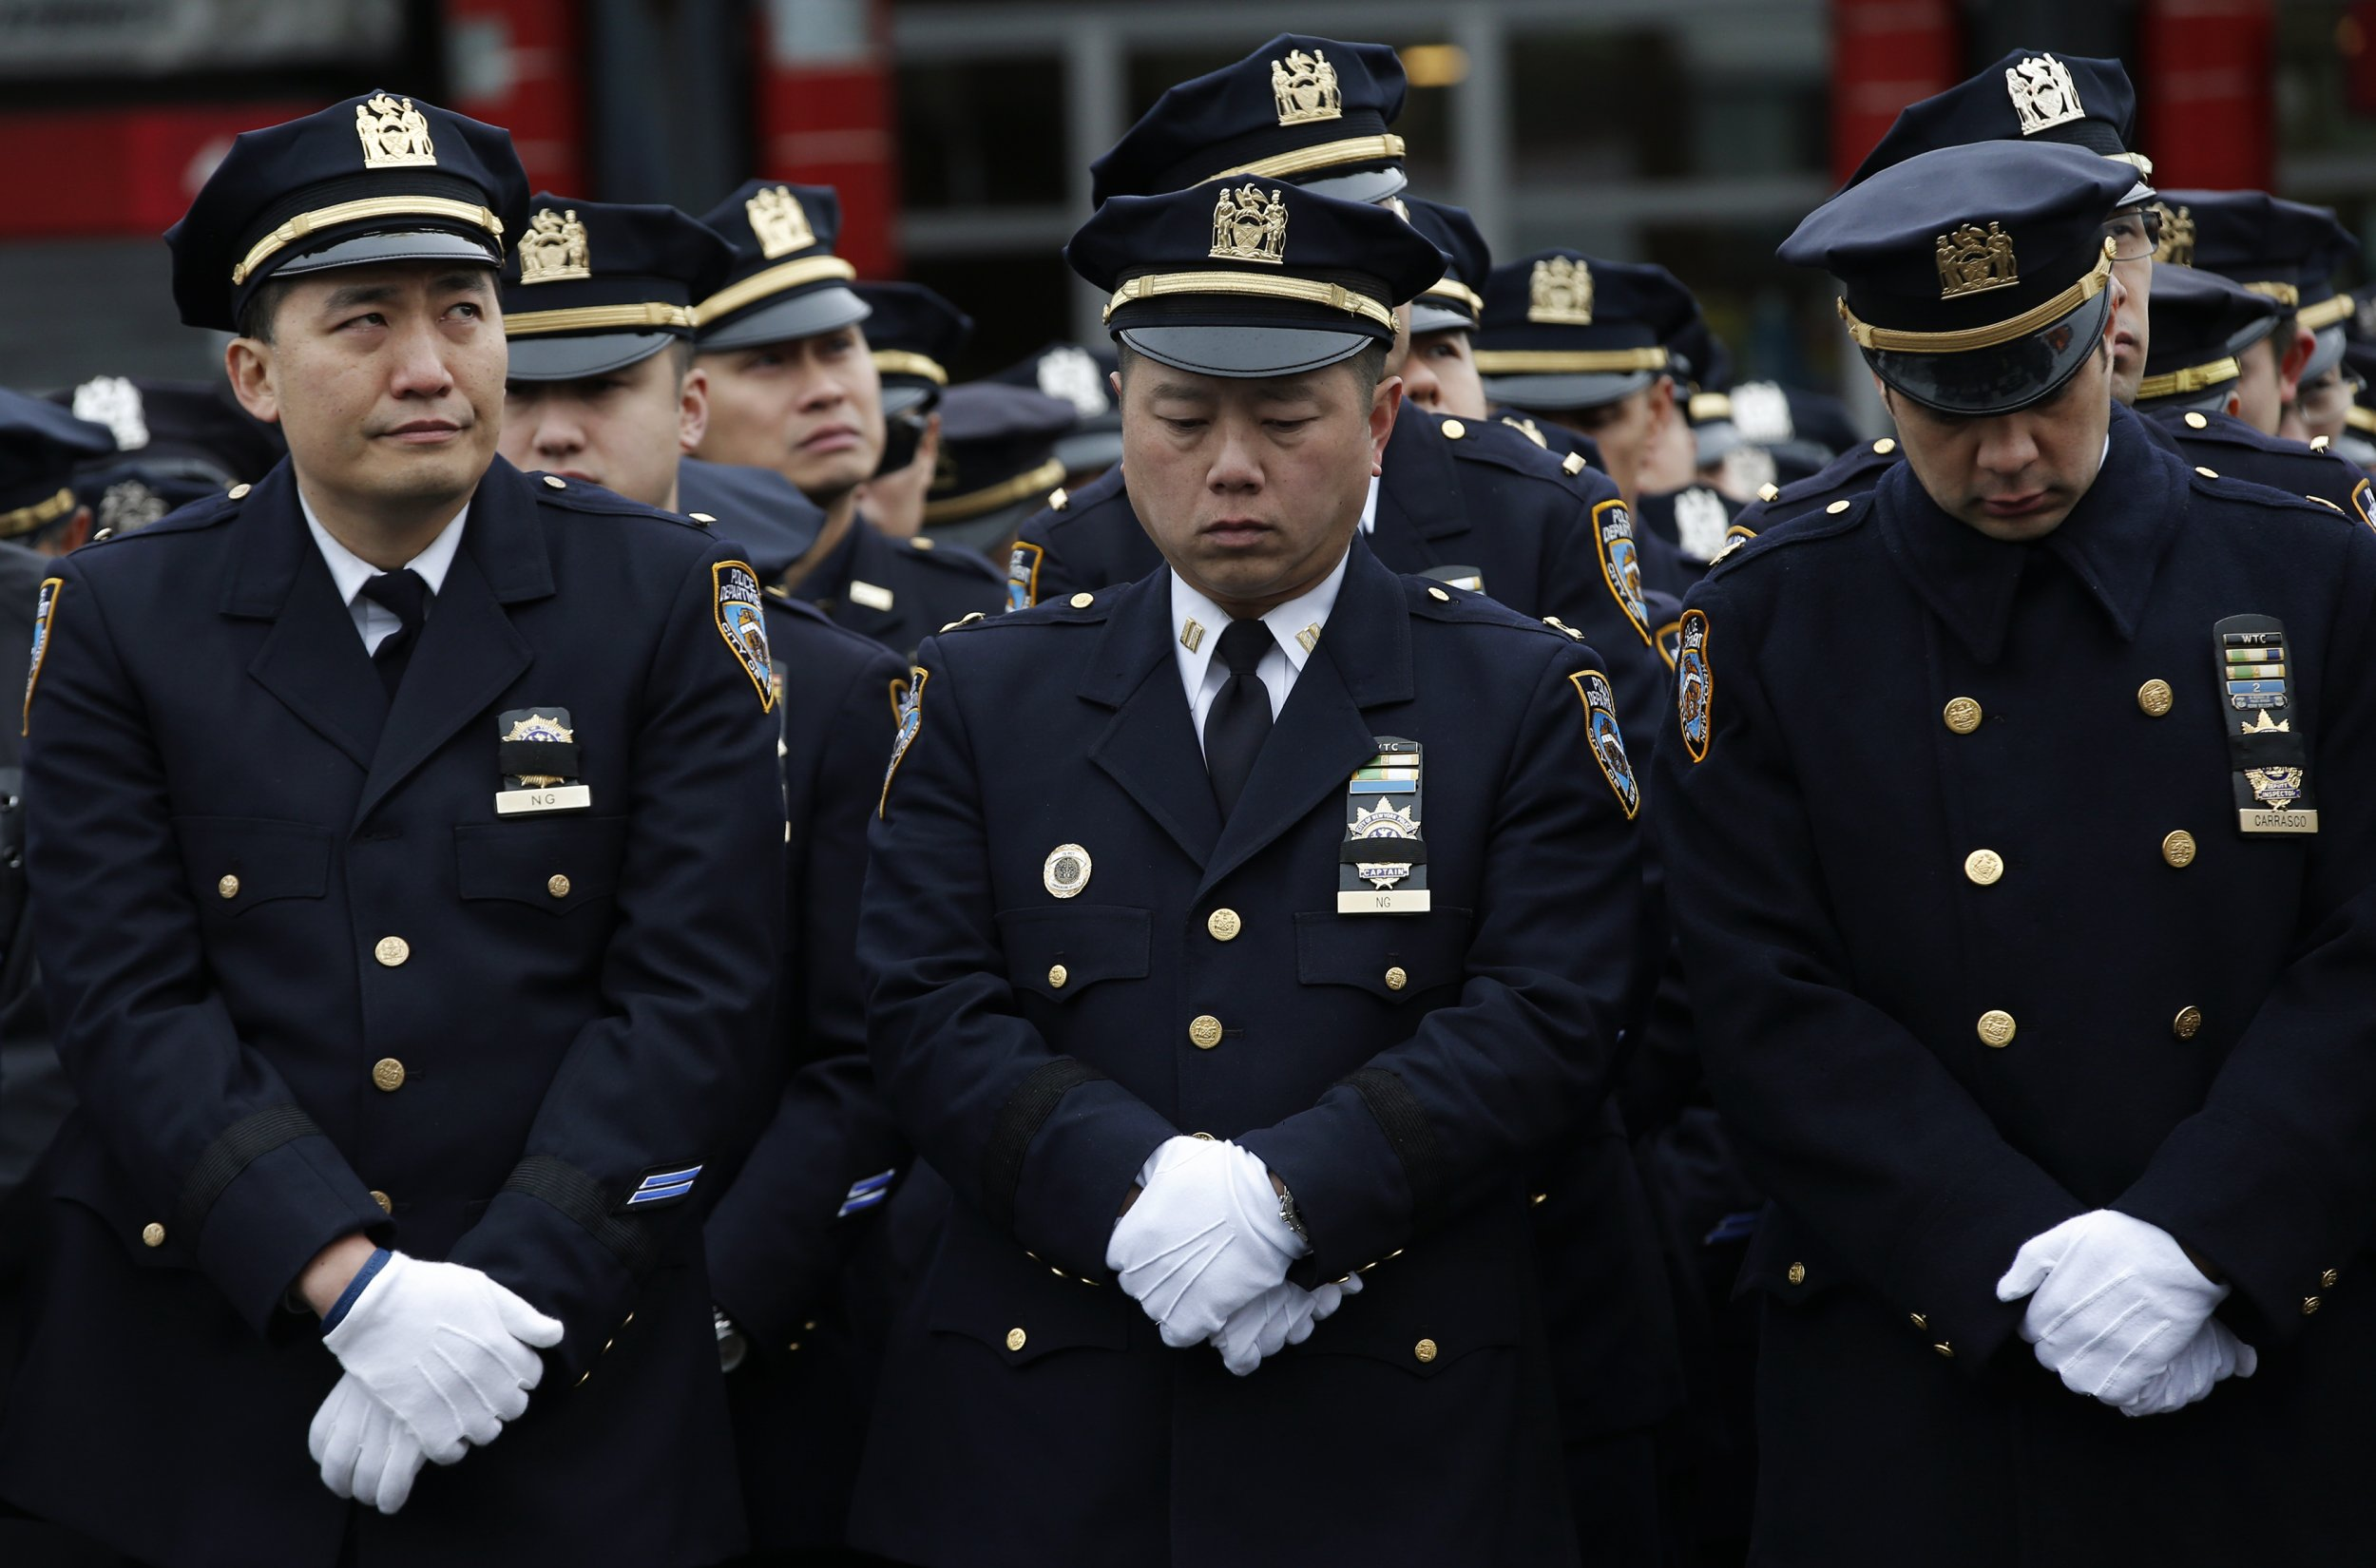 Brooklyn police